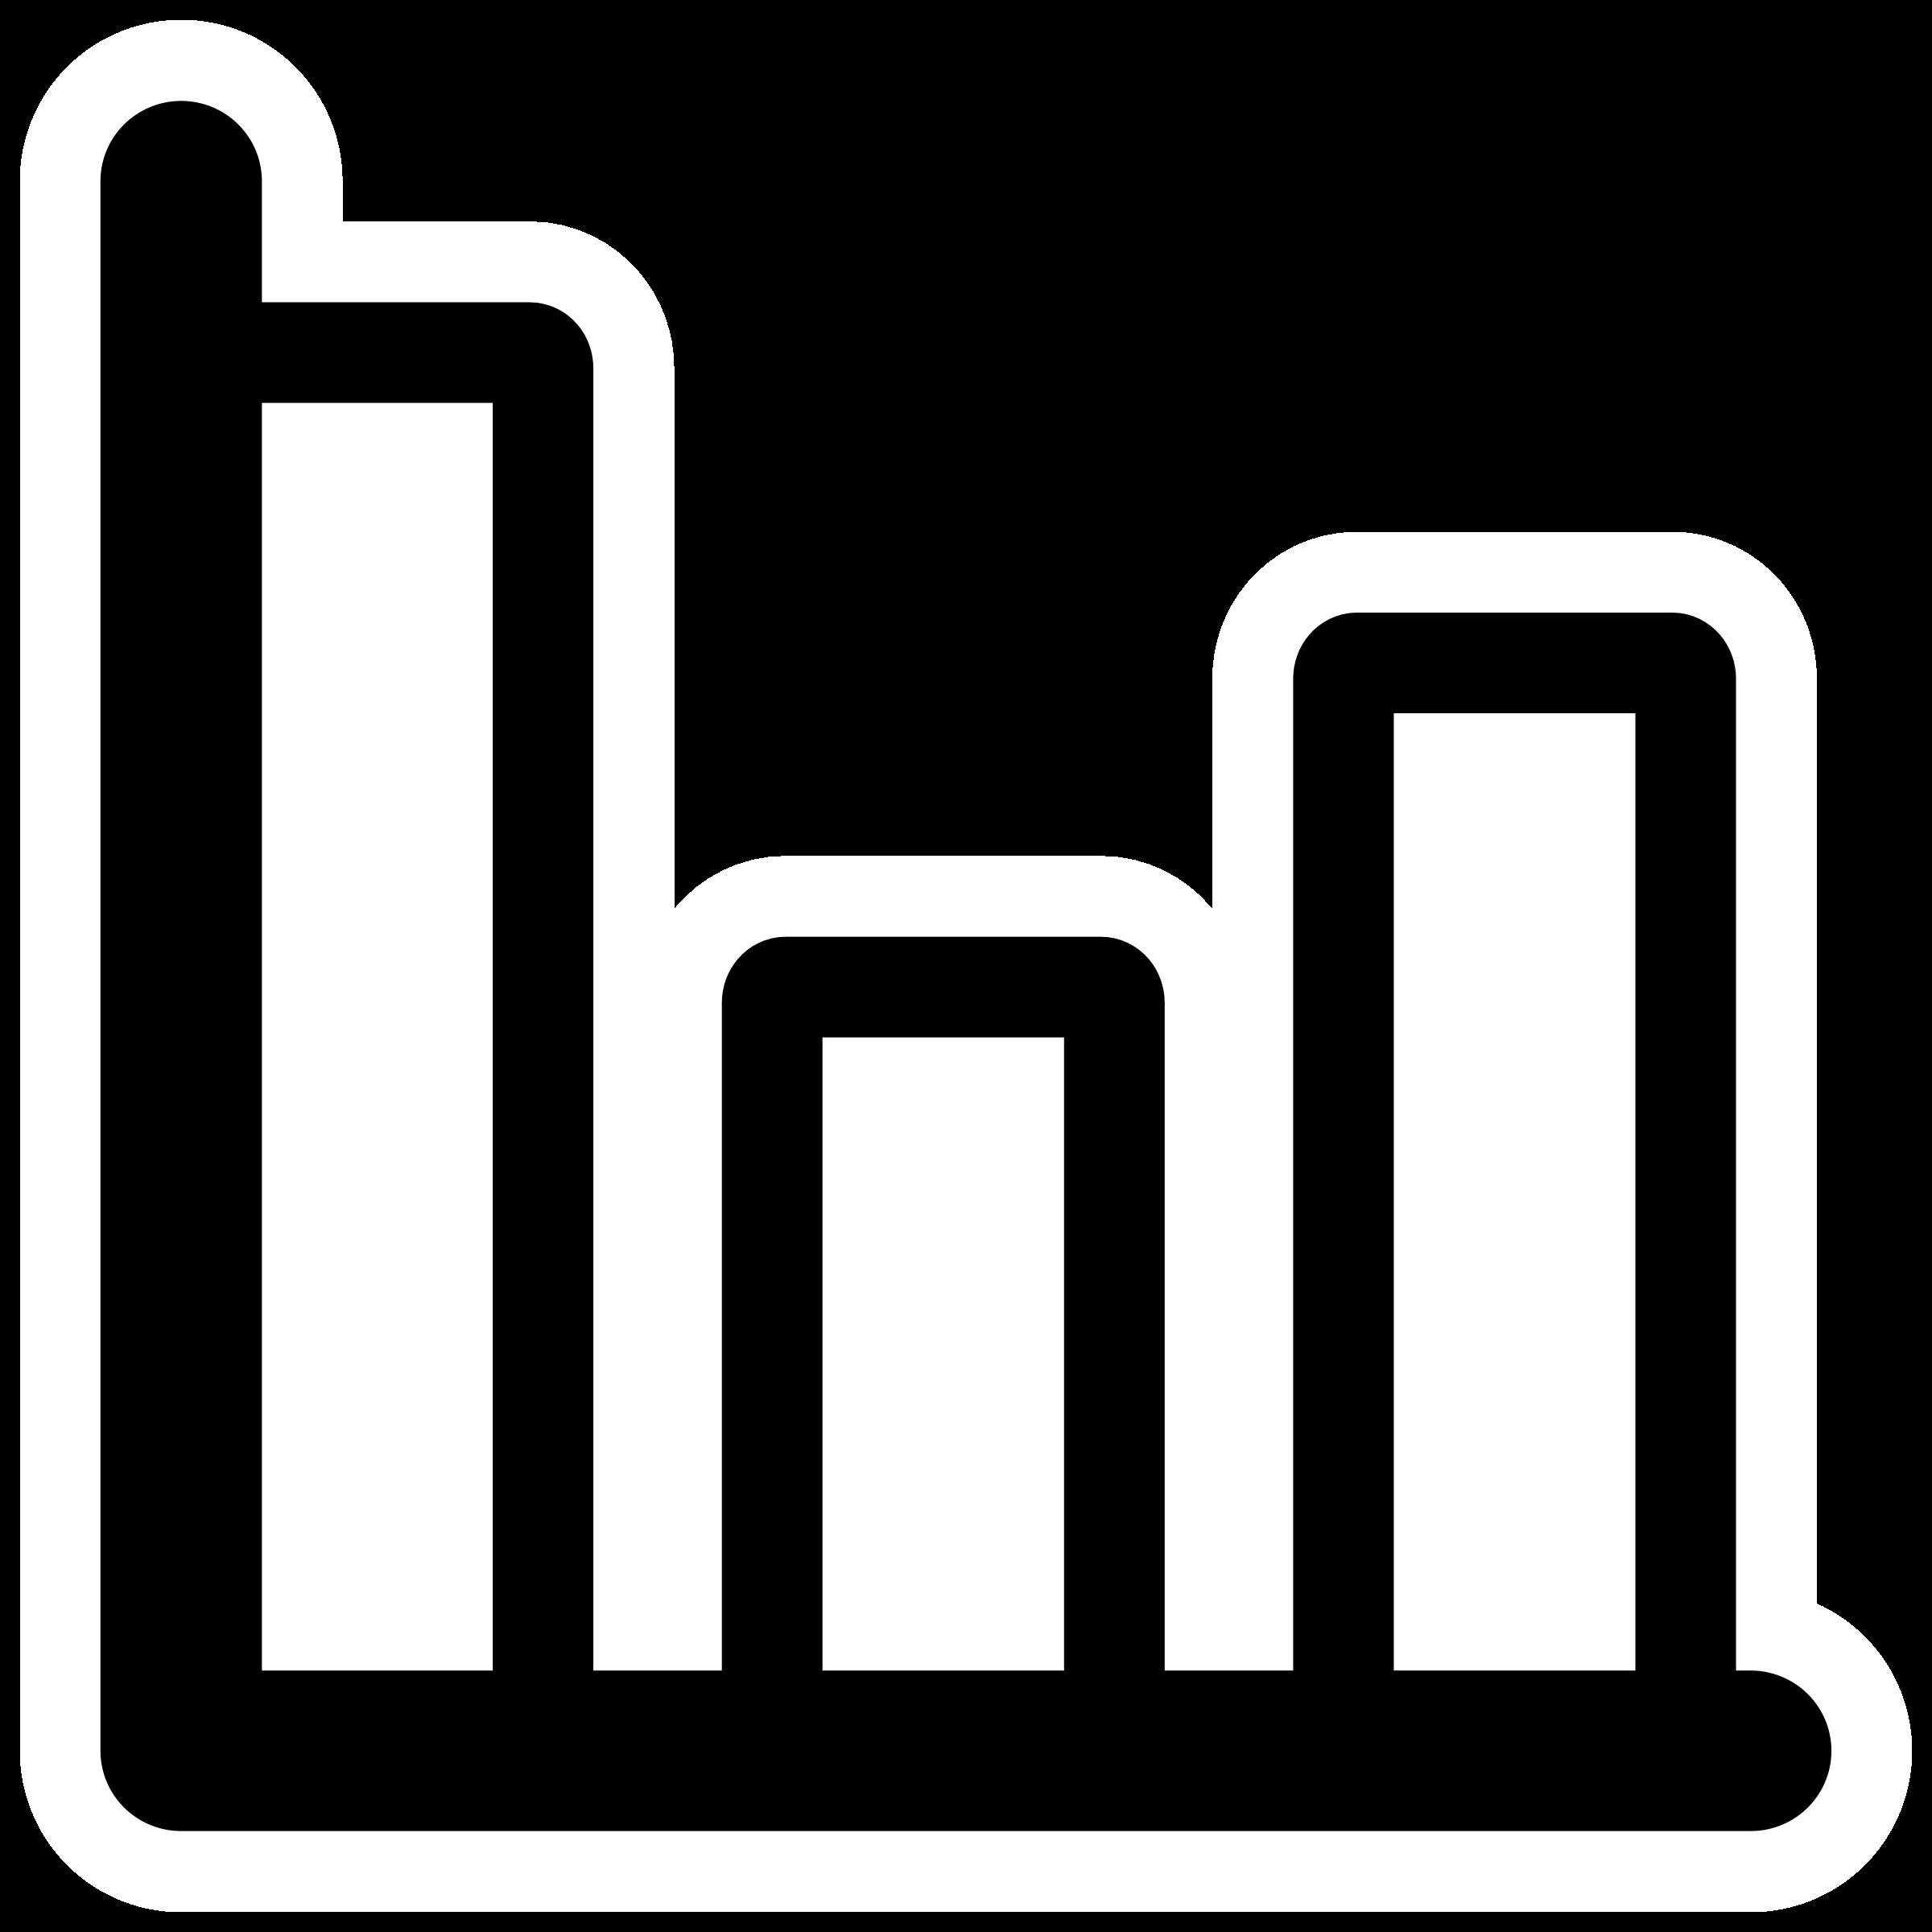 510 Statistics free clipart.